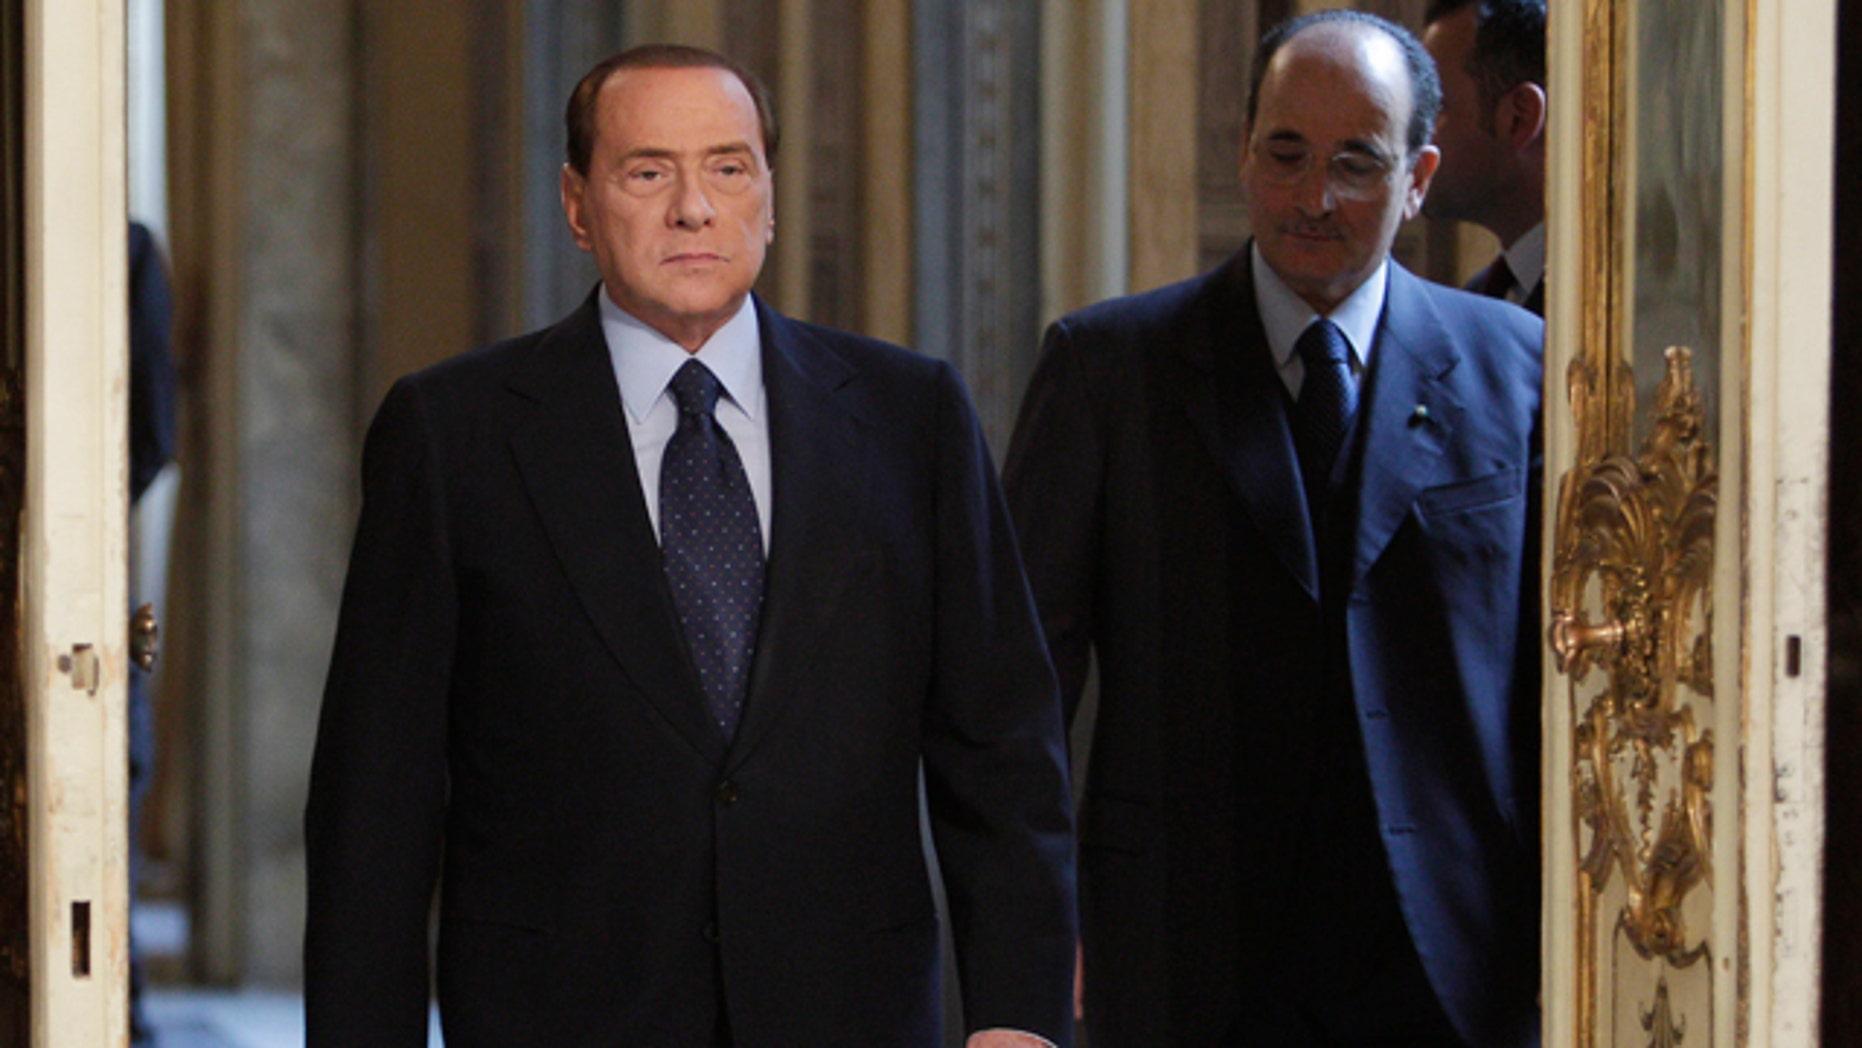 March 14: Italian premier Silvio Berlusconi arrives to meet European Commission president Jose Manuel Barroso, not in photo, at Palazzo Chigi in Rome. (AP)